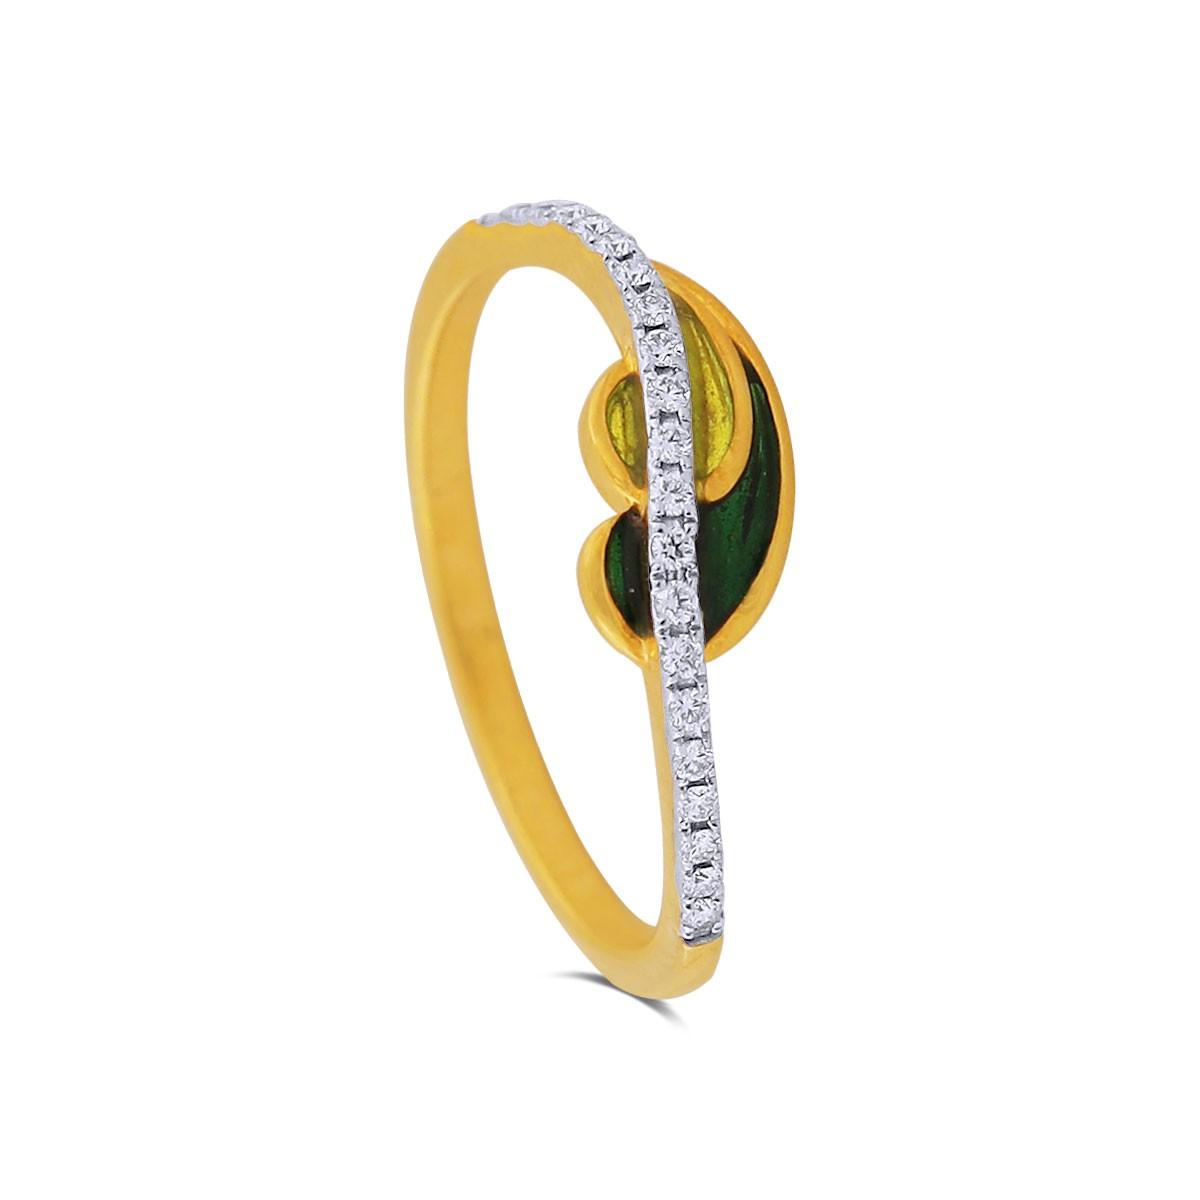 Elise Yellow Gold Diamond Ring